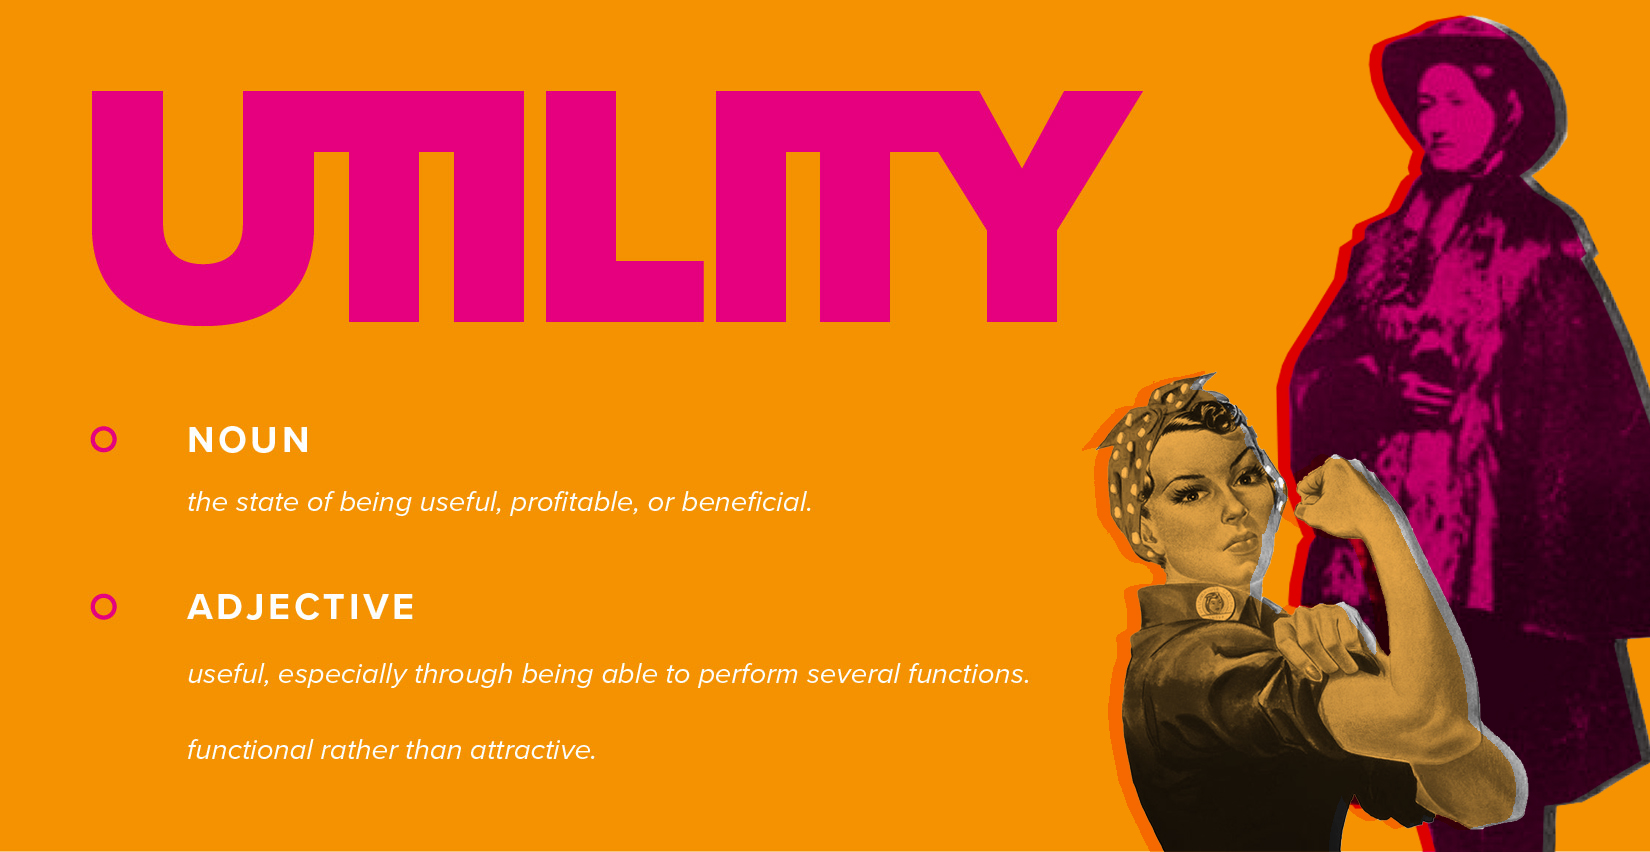 UTILITY2.jpg